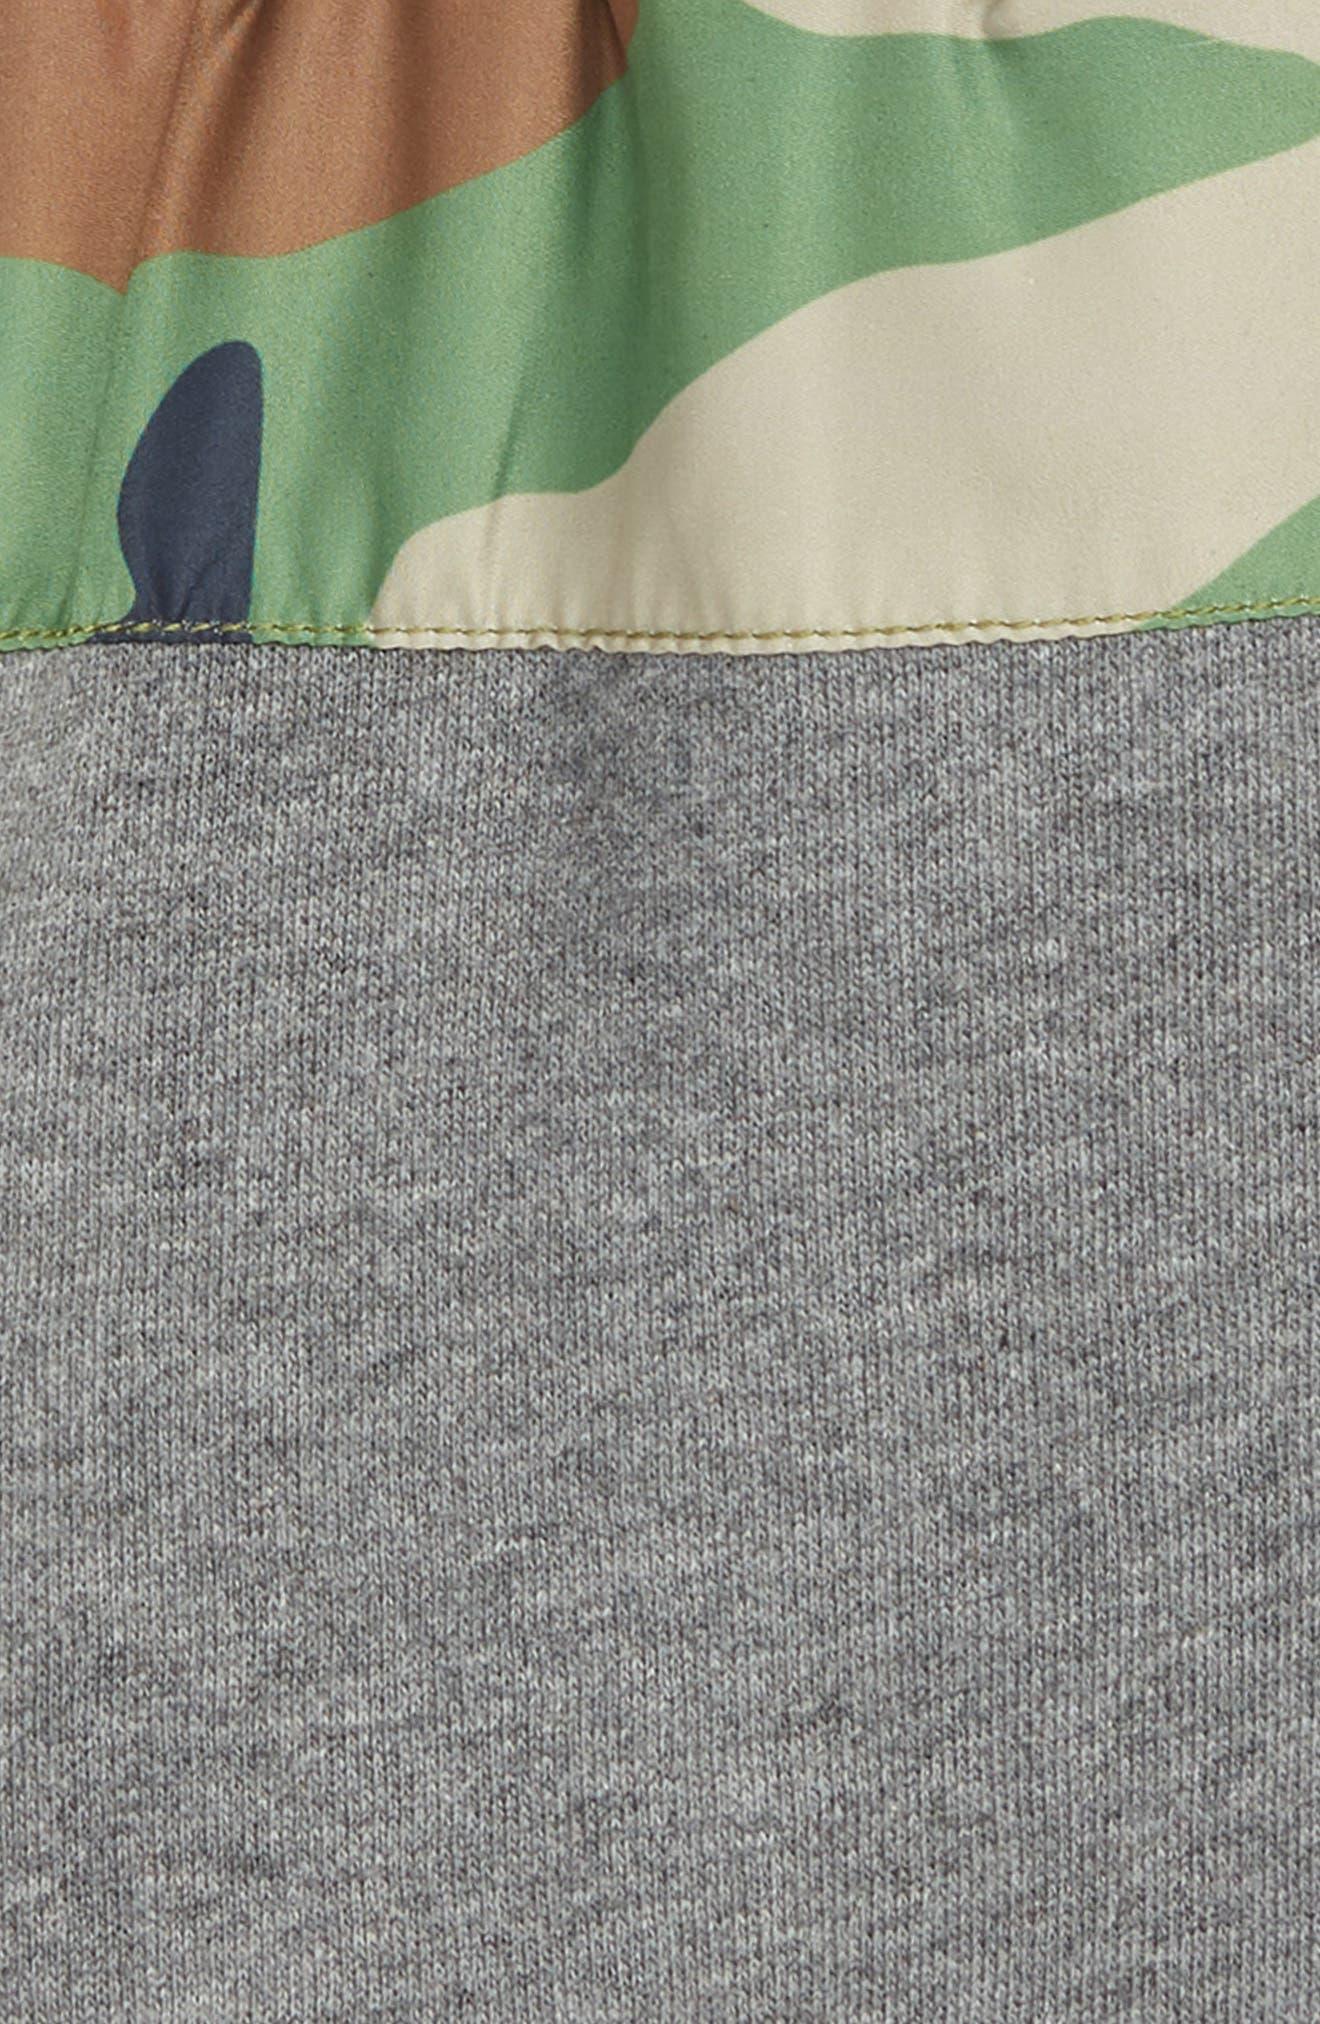 Ryder Camo Shorts,                             Alternate thumbnail 2, color,                             HEATHER GREY